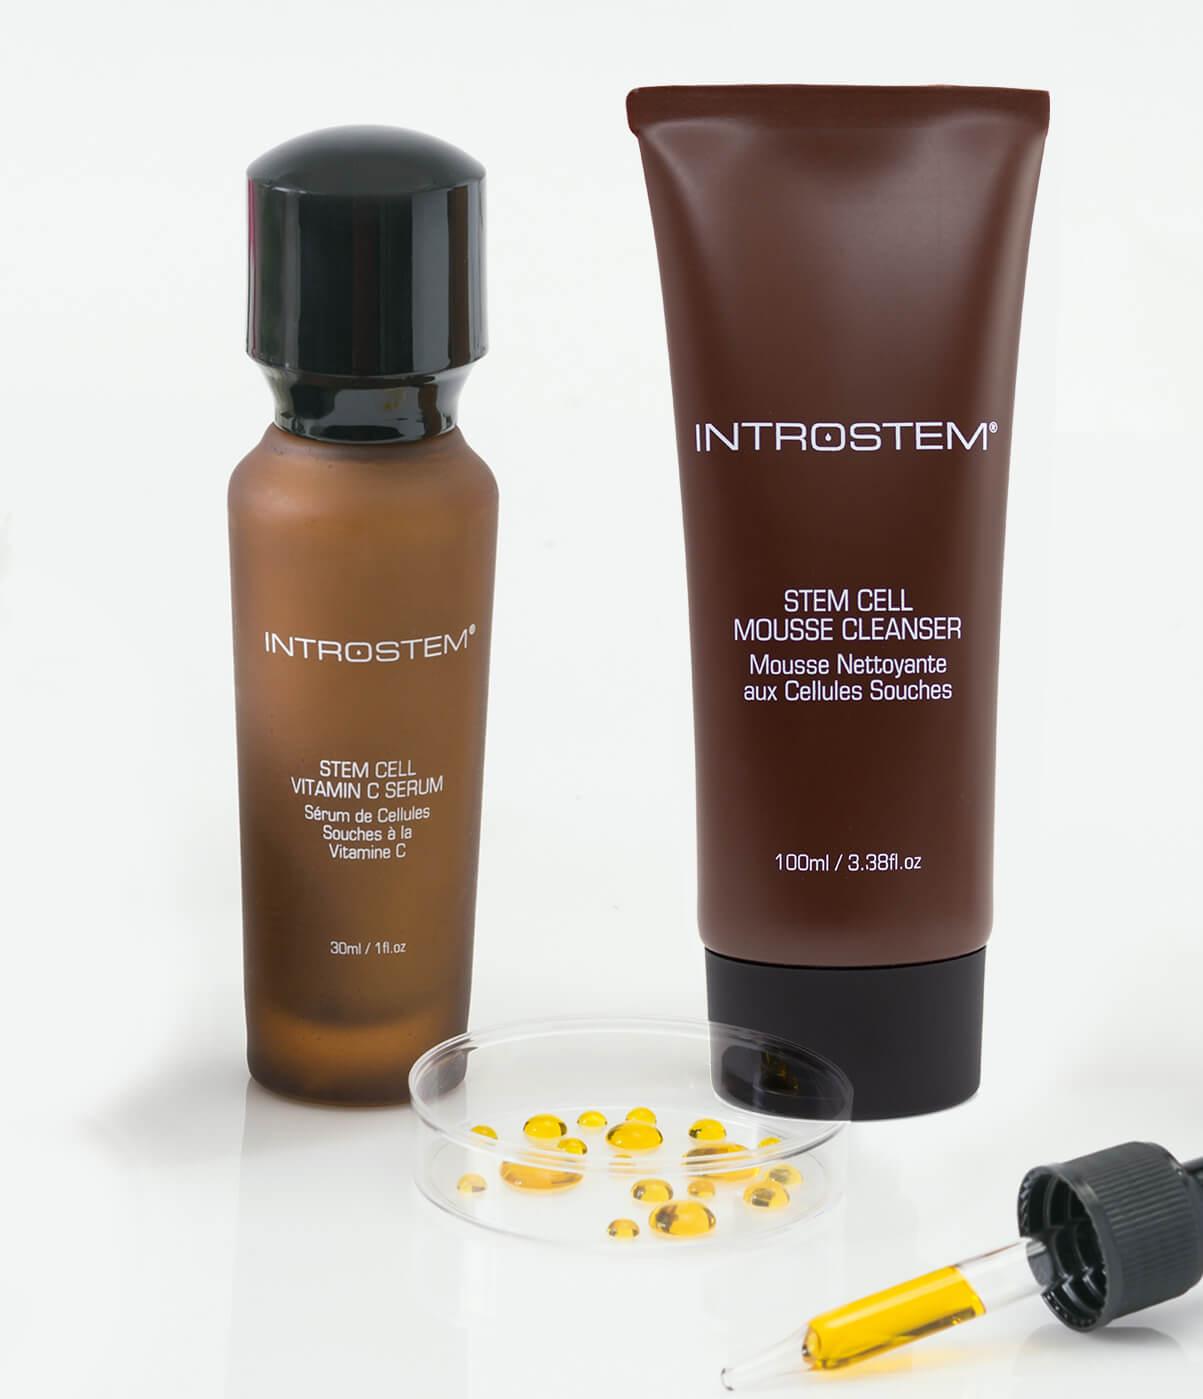 Introstem skincare products